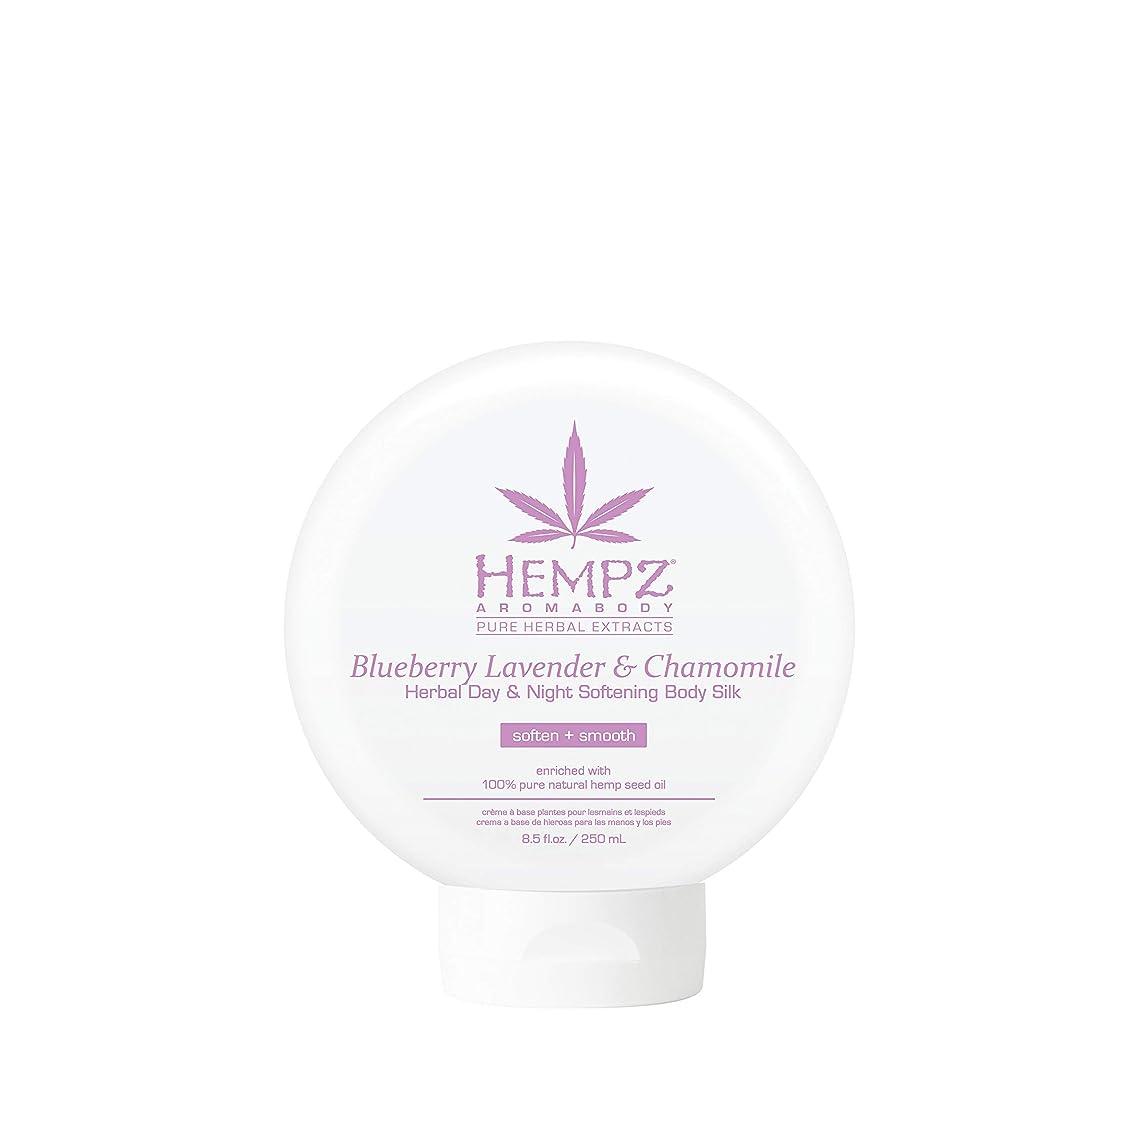 Blueberry Lavender & Chamomile Herbal Day & Night Softening Body Silk